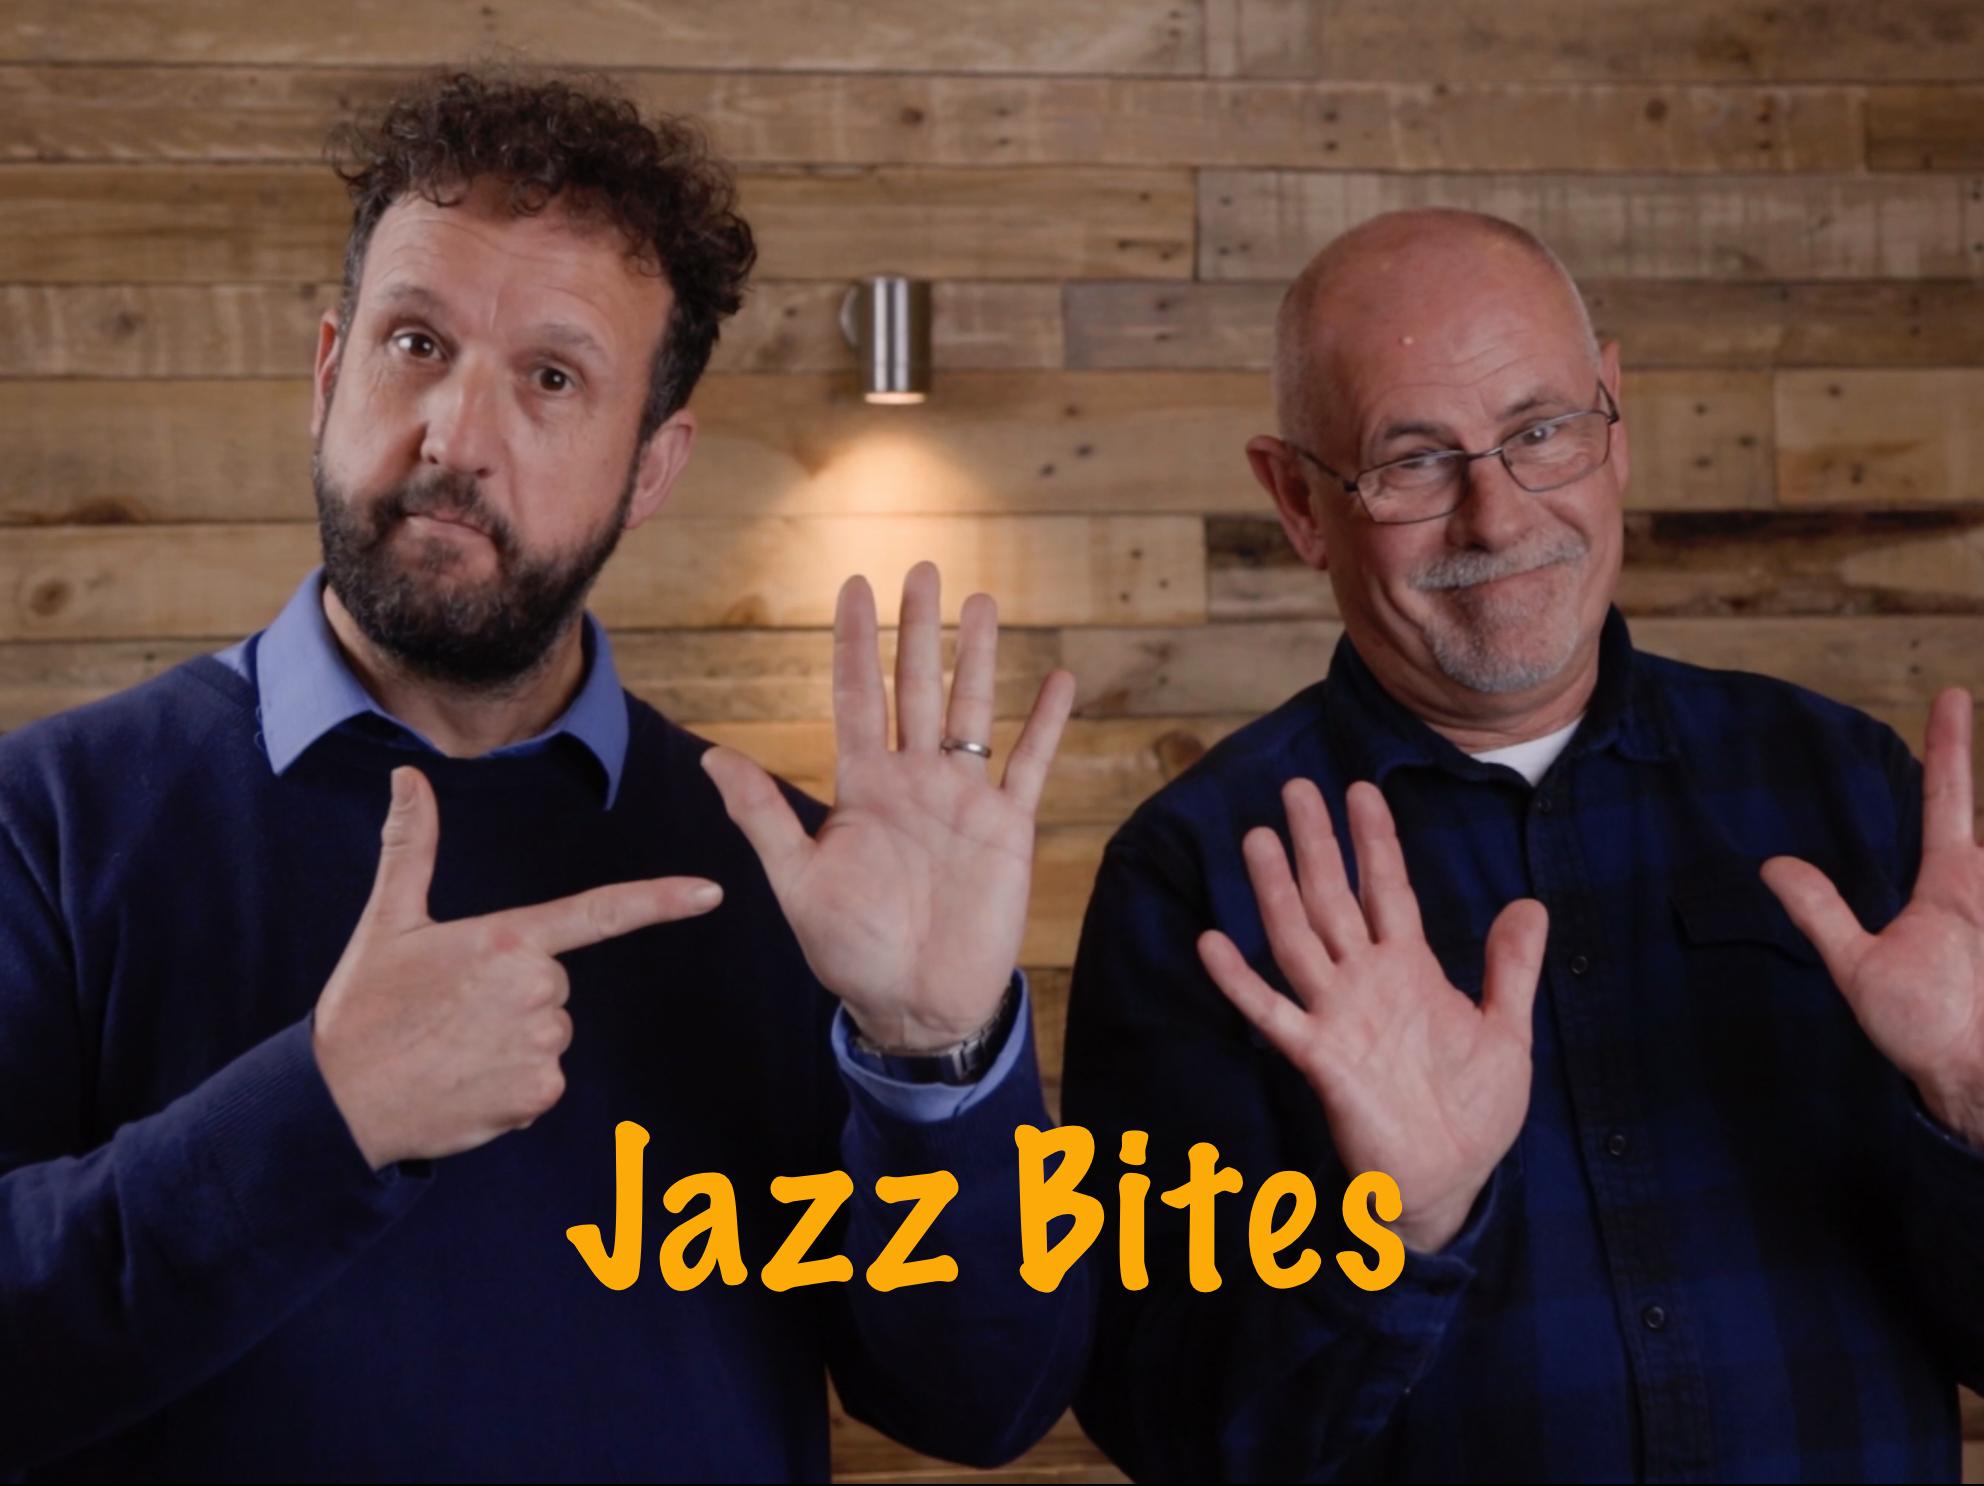 Jazz Bites